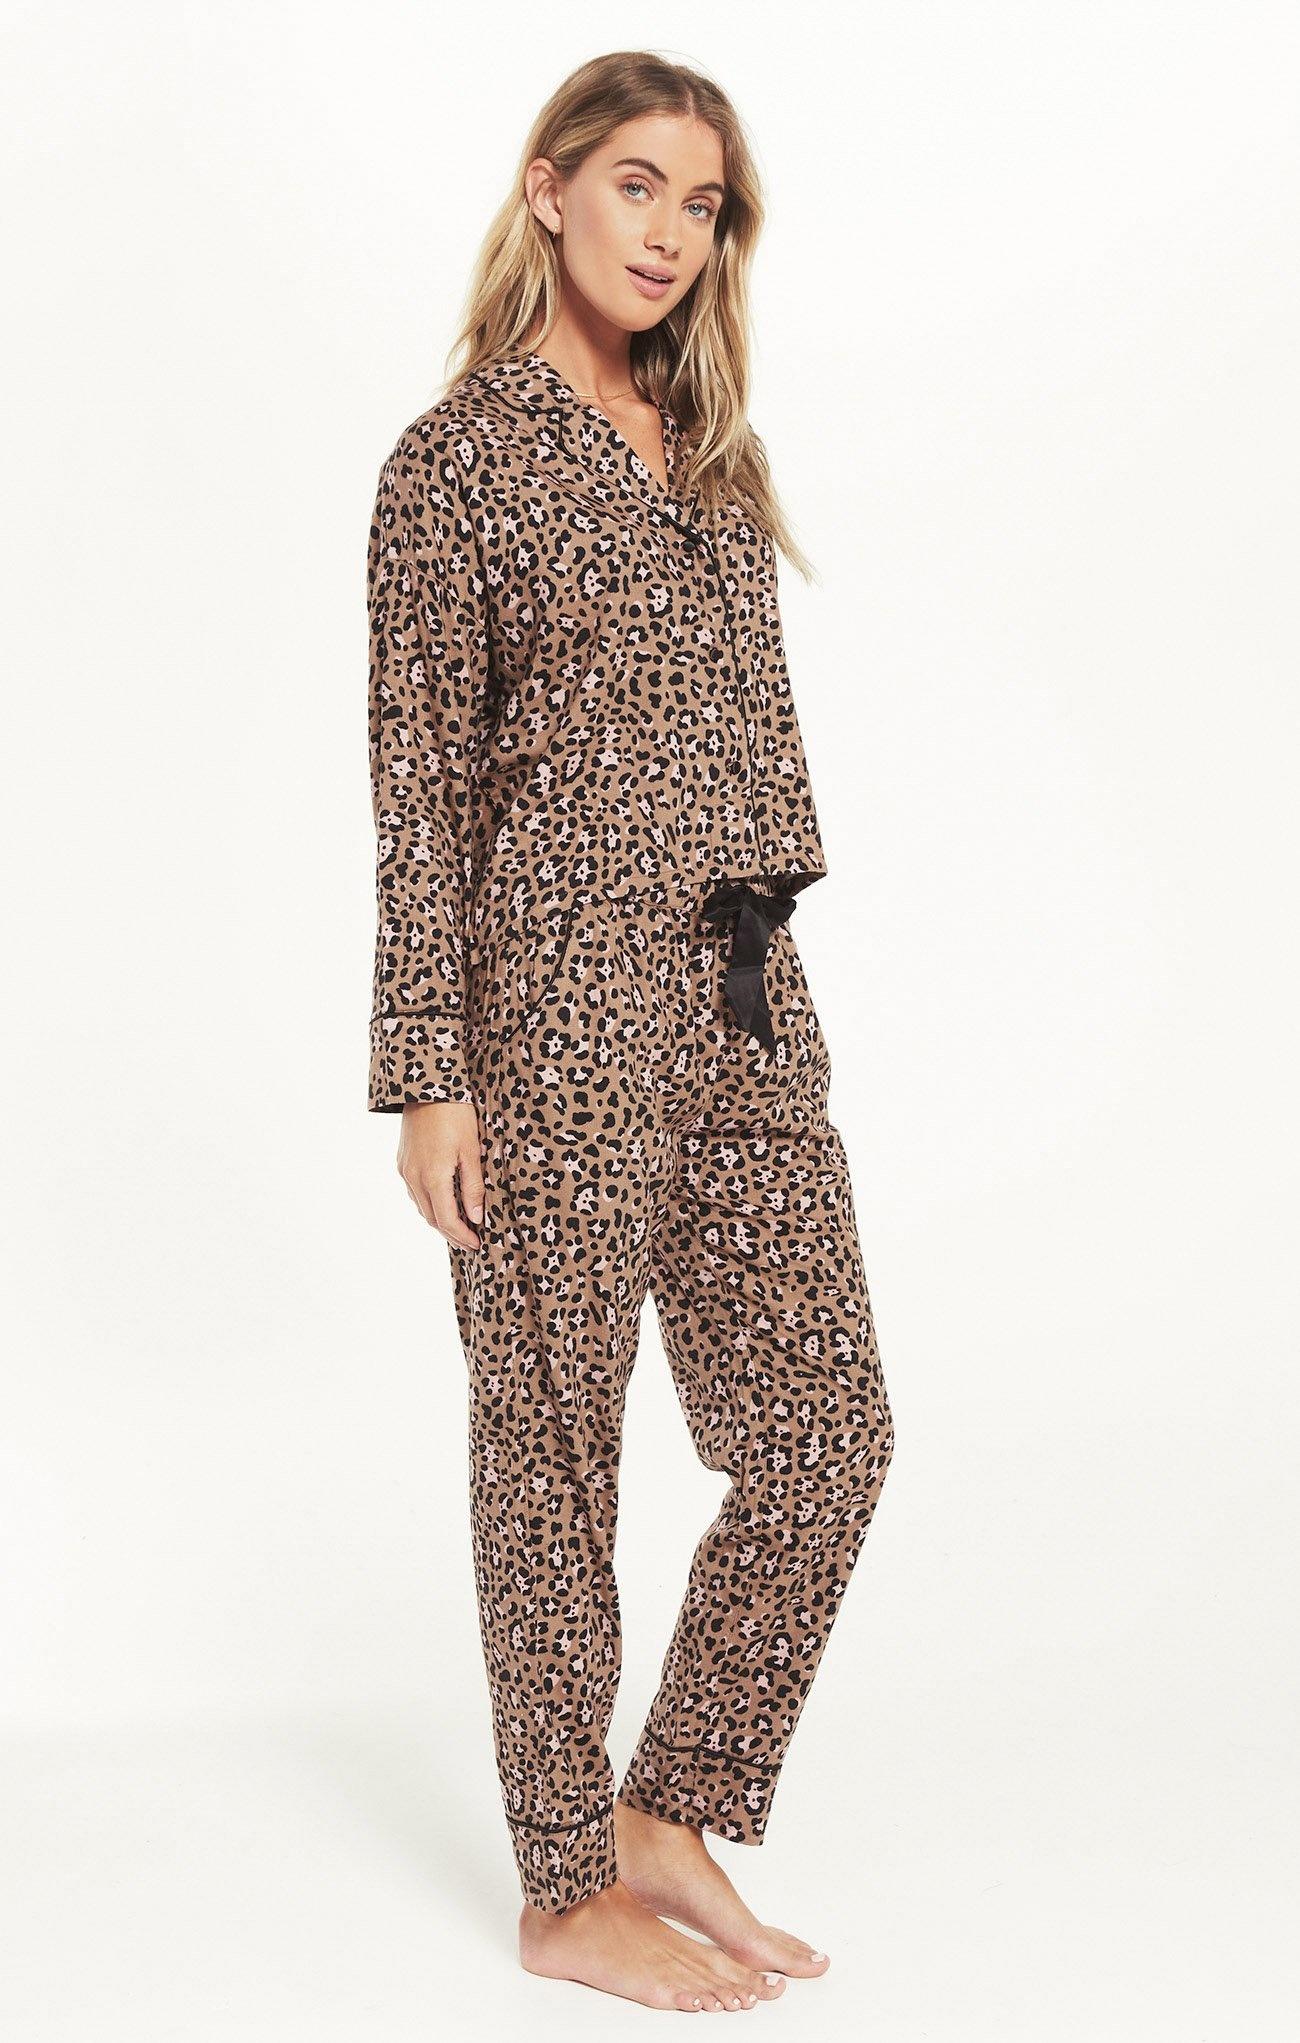 Dream State Leopard PJ Set